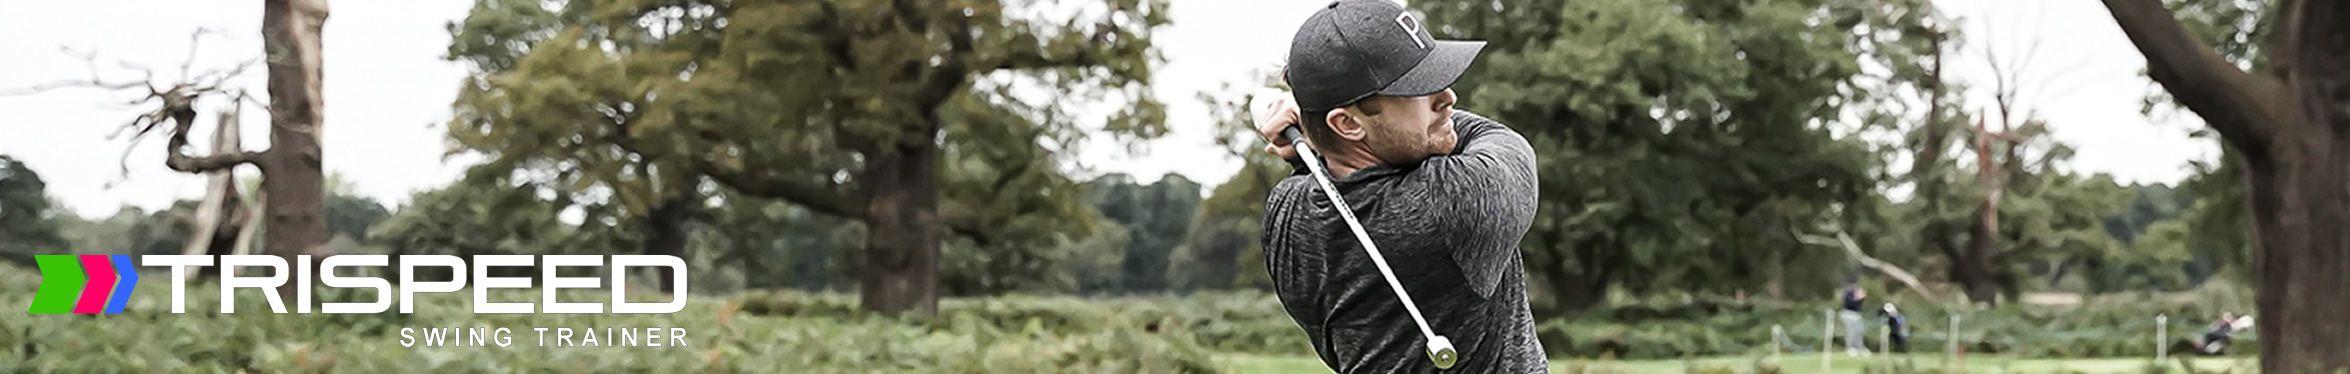 TriSpeed Golf